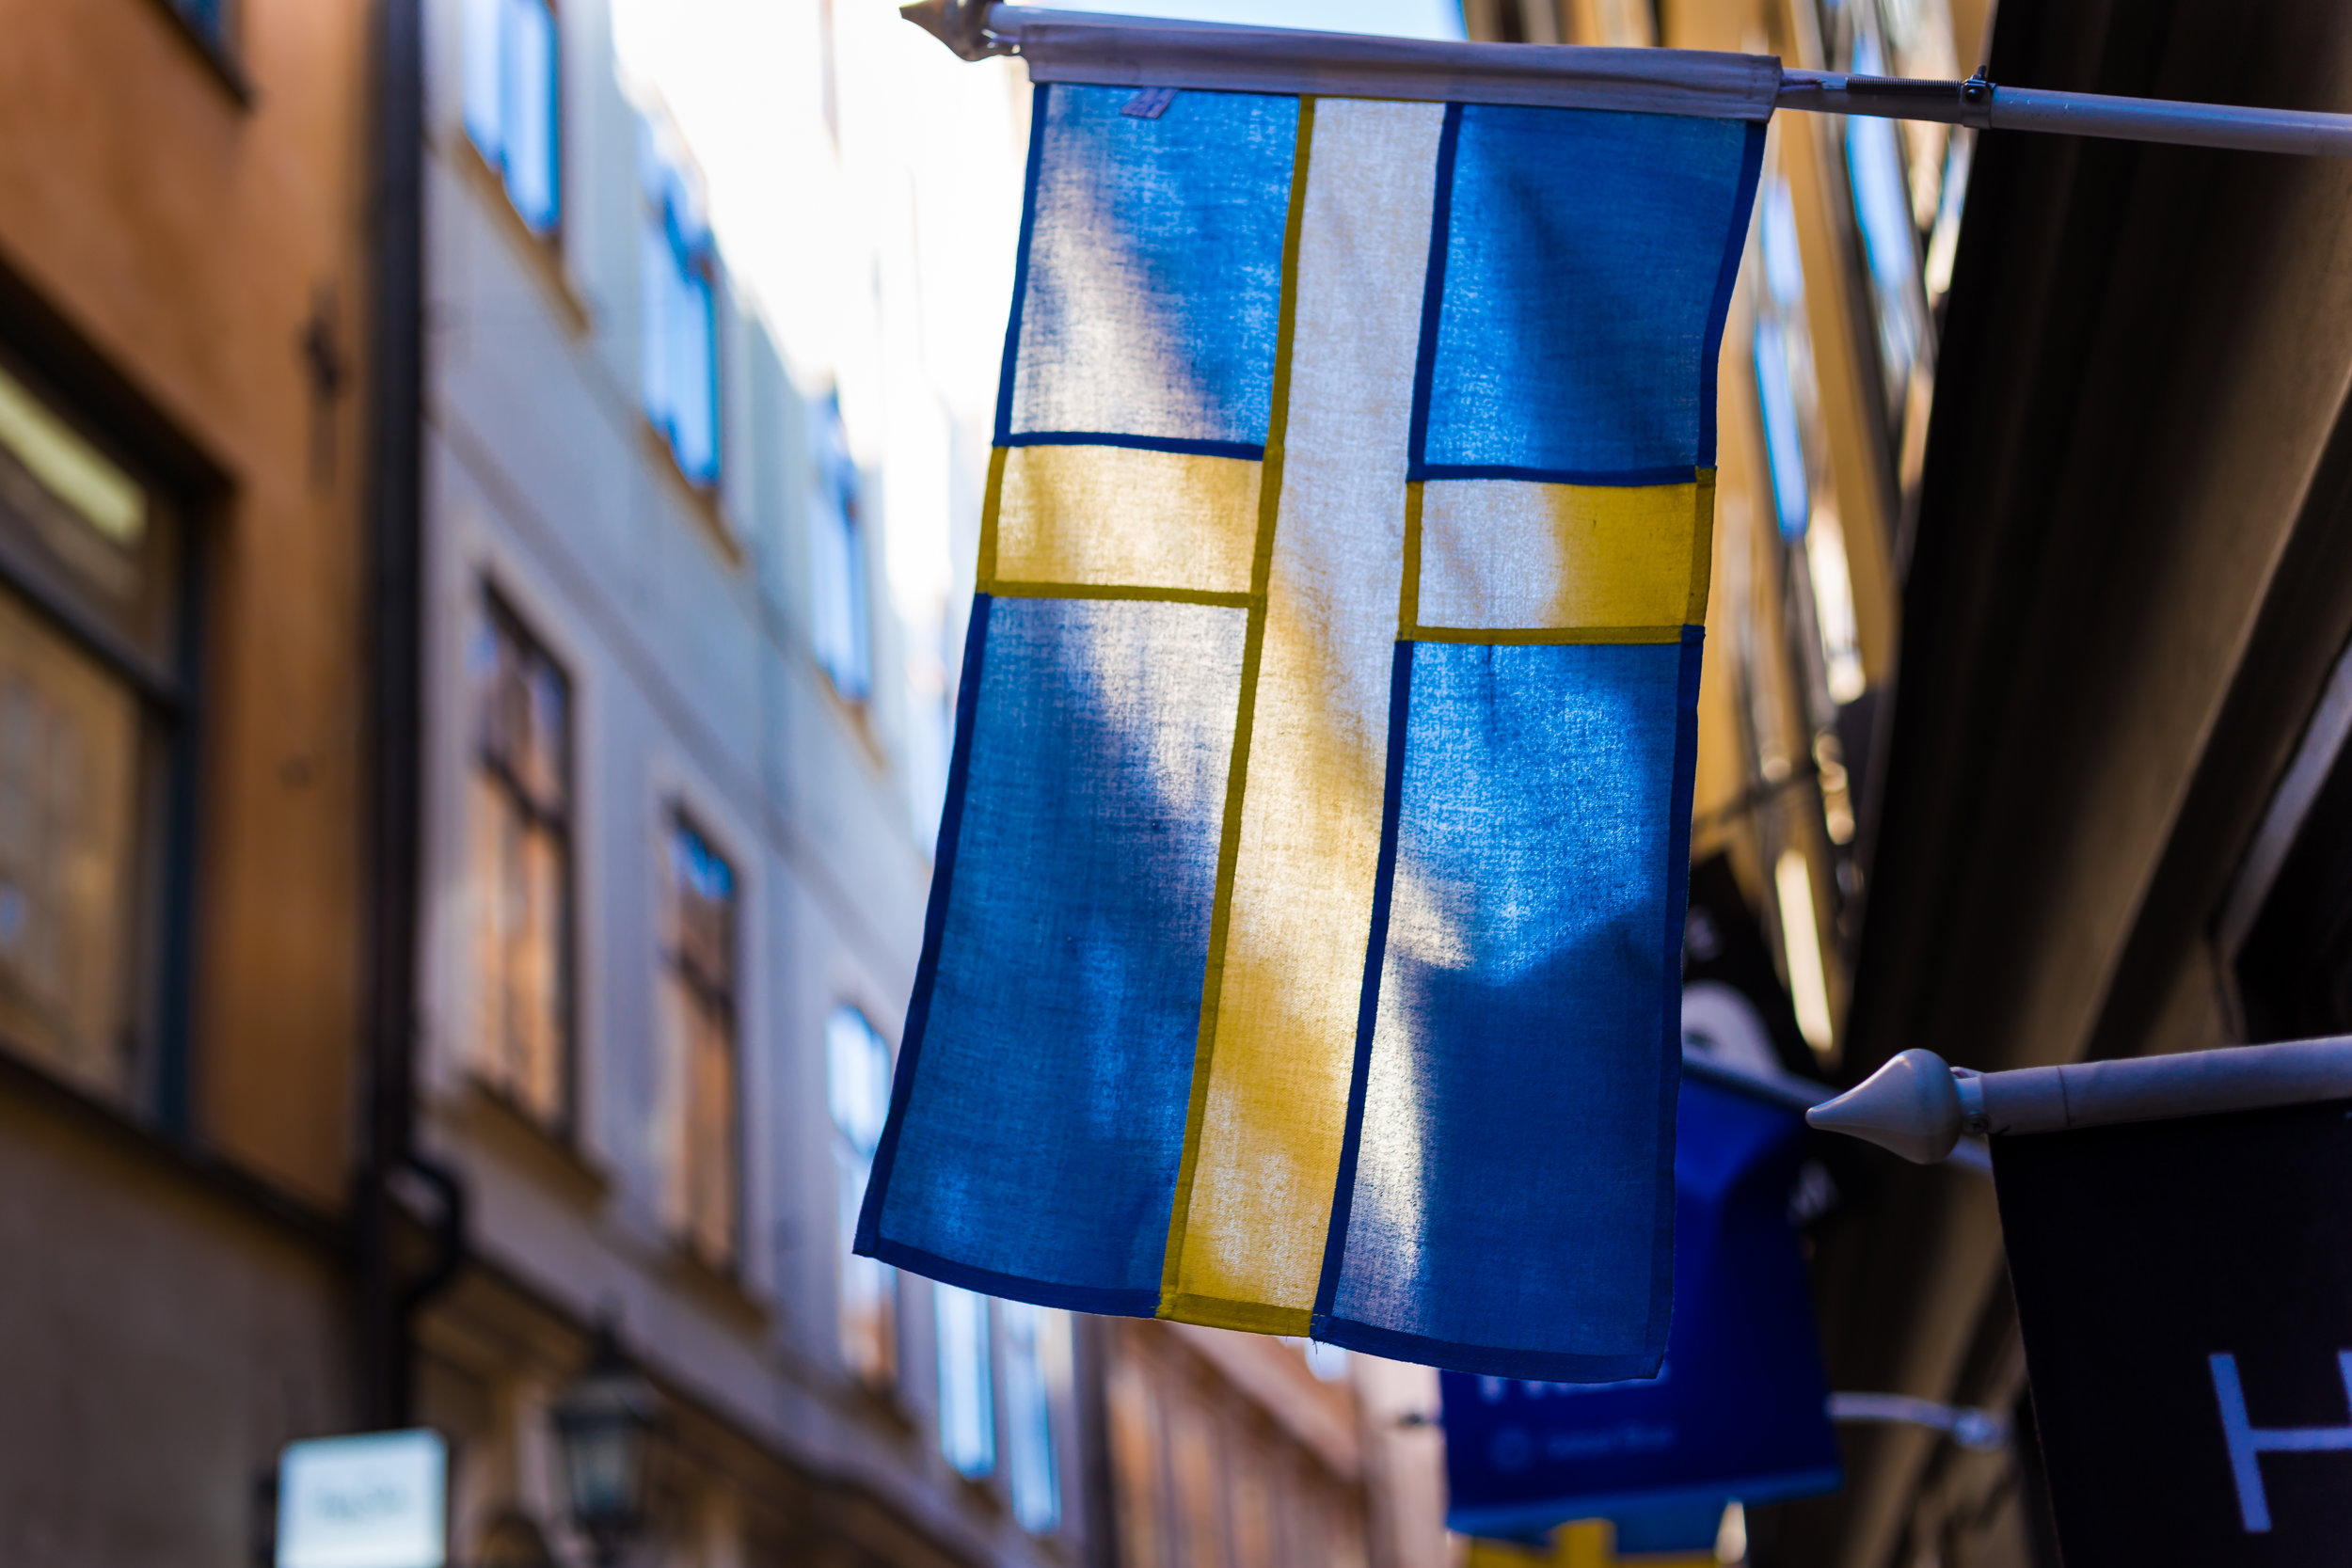 GRETA THUNBERG: SWEDISH TEEN CLIMATE ACTIVIST NOMINATED FOR NOBEL PEACE PRIZE -